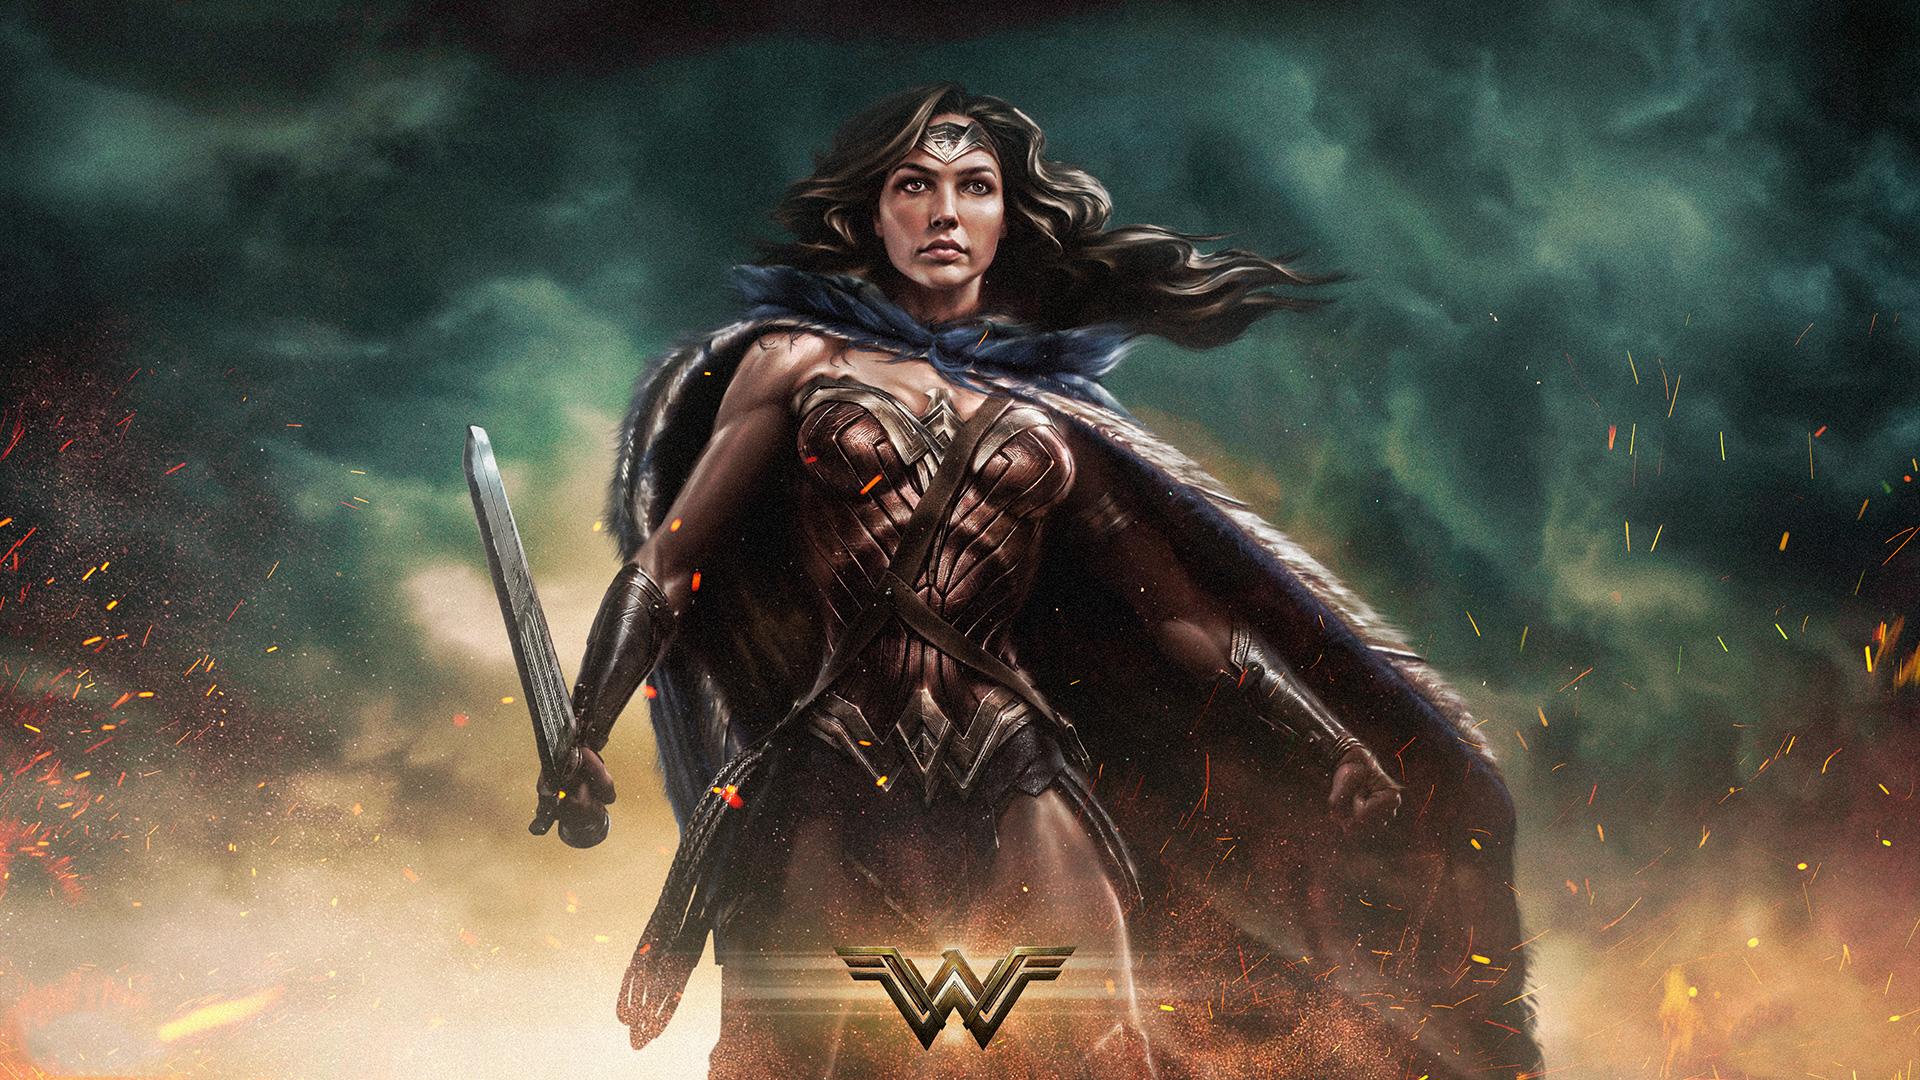 Wonder Woman 2 2019 Hd Movies 4k Wallpapers Images